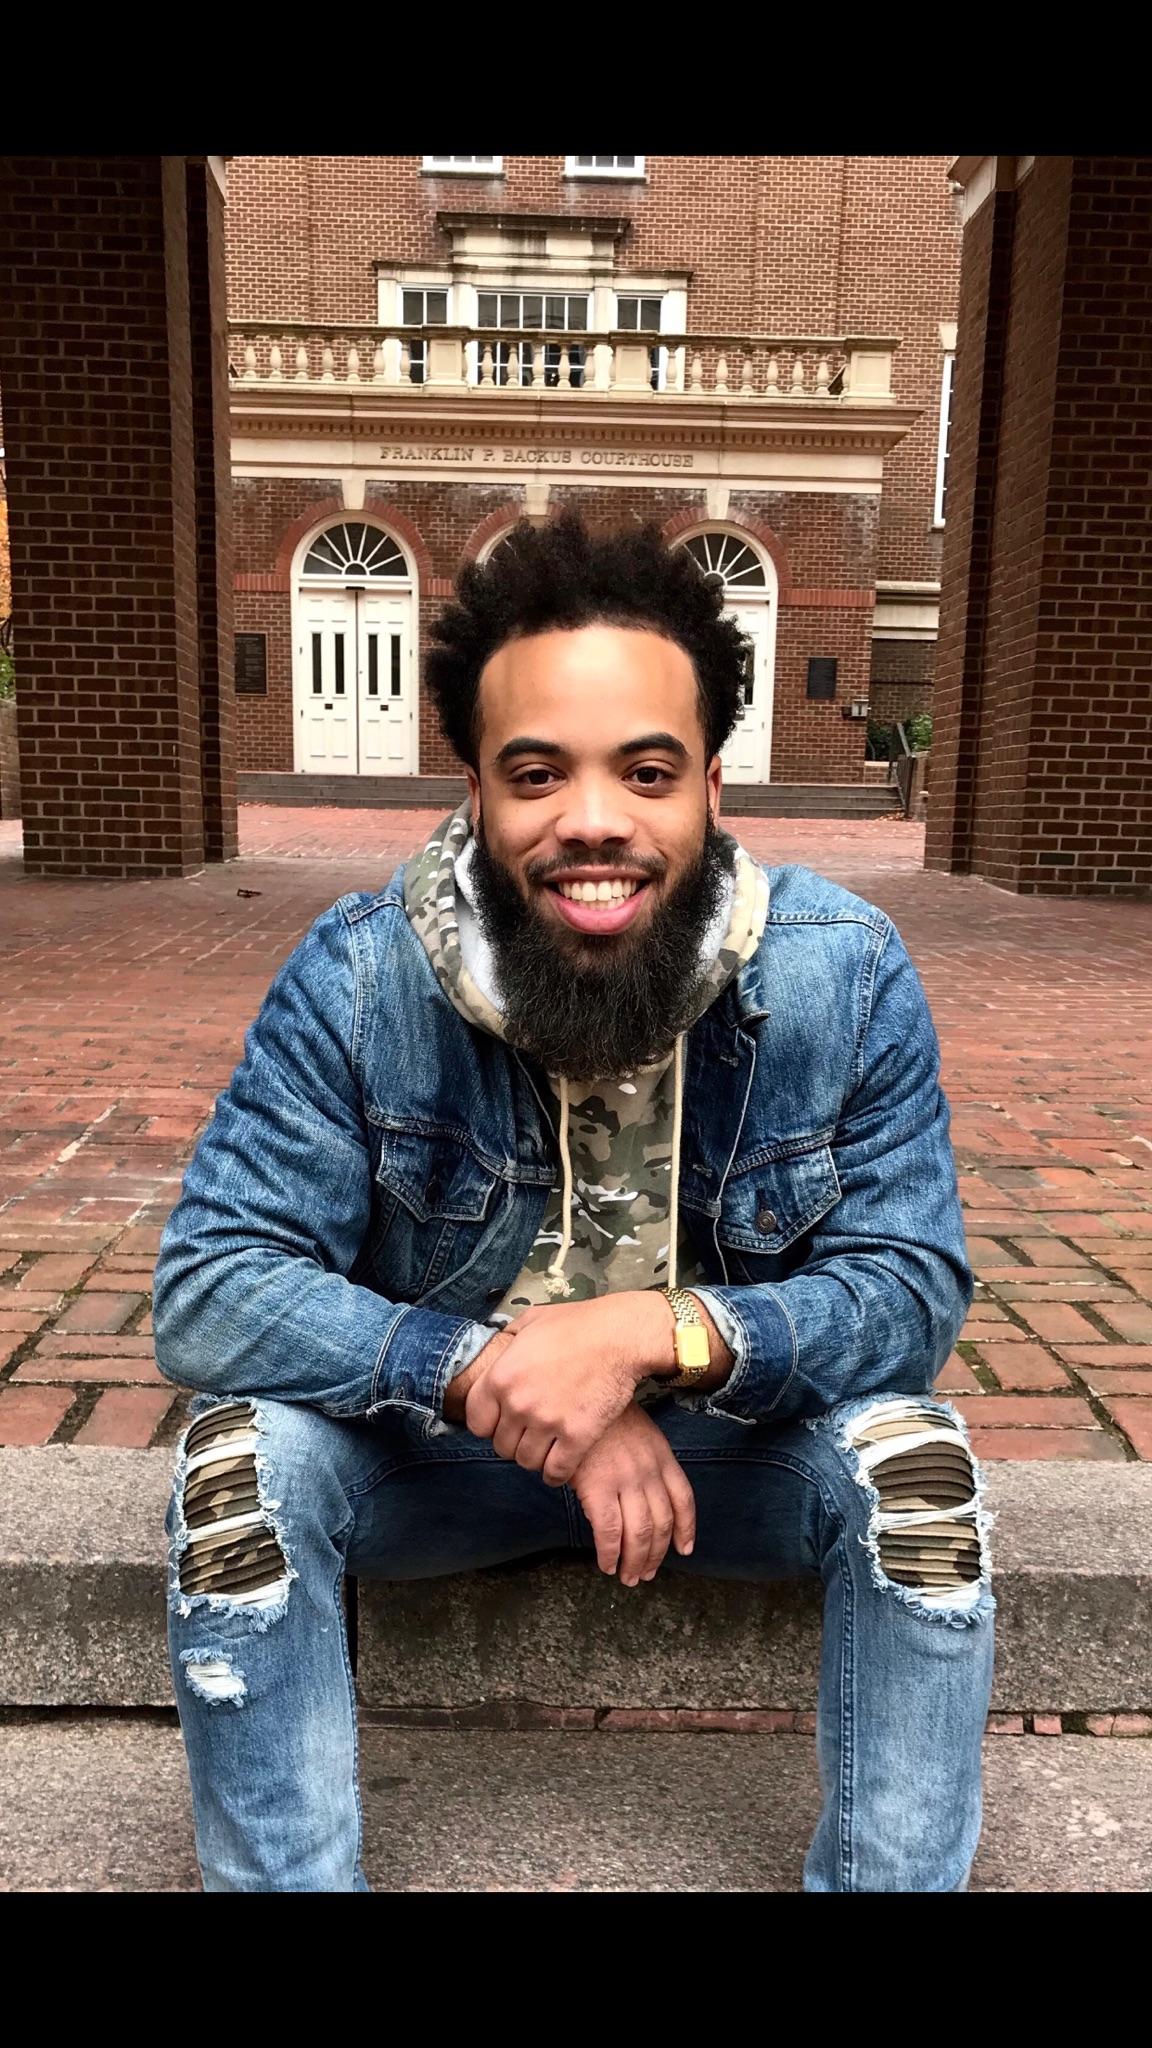 Meet Chad G. - Senior//Liberty University//Servant Leader Intern